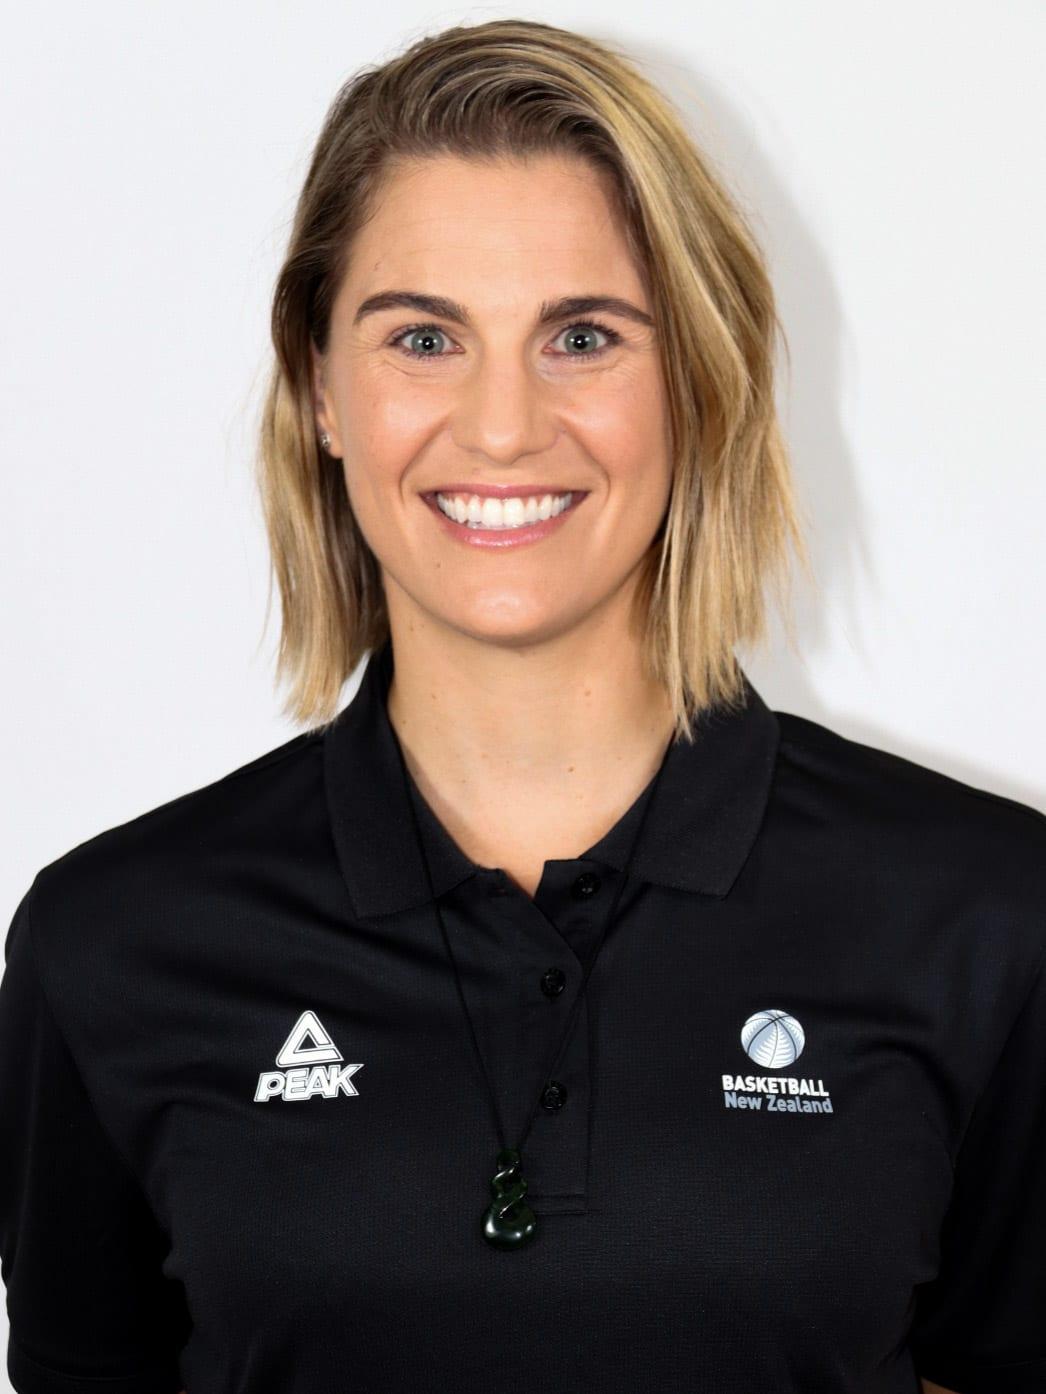 Melissa Downer